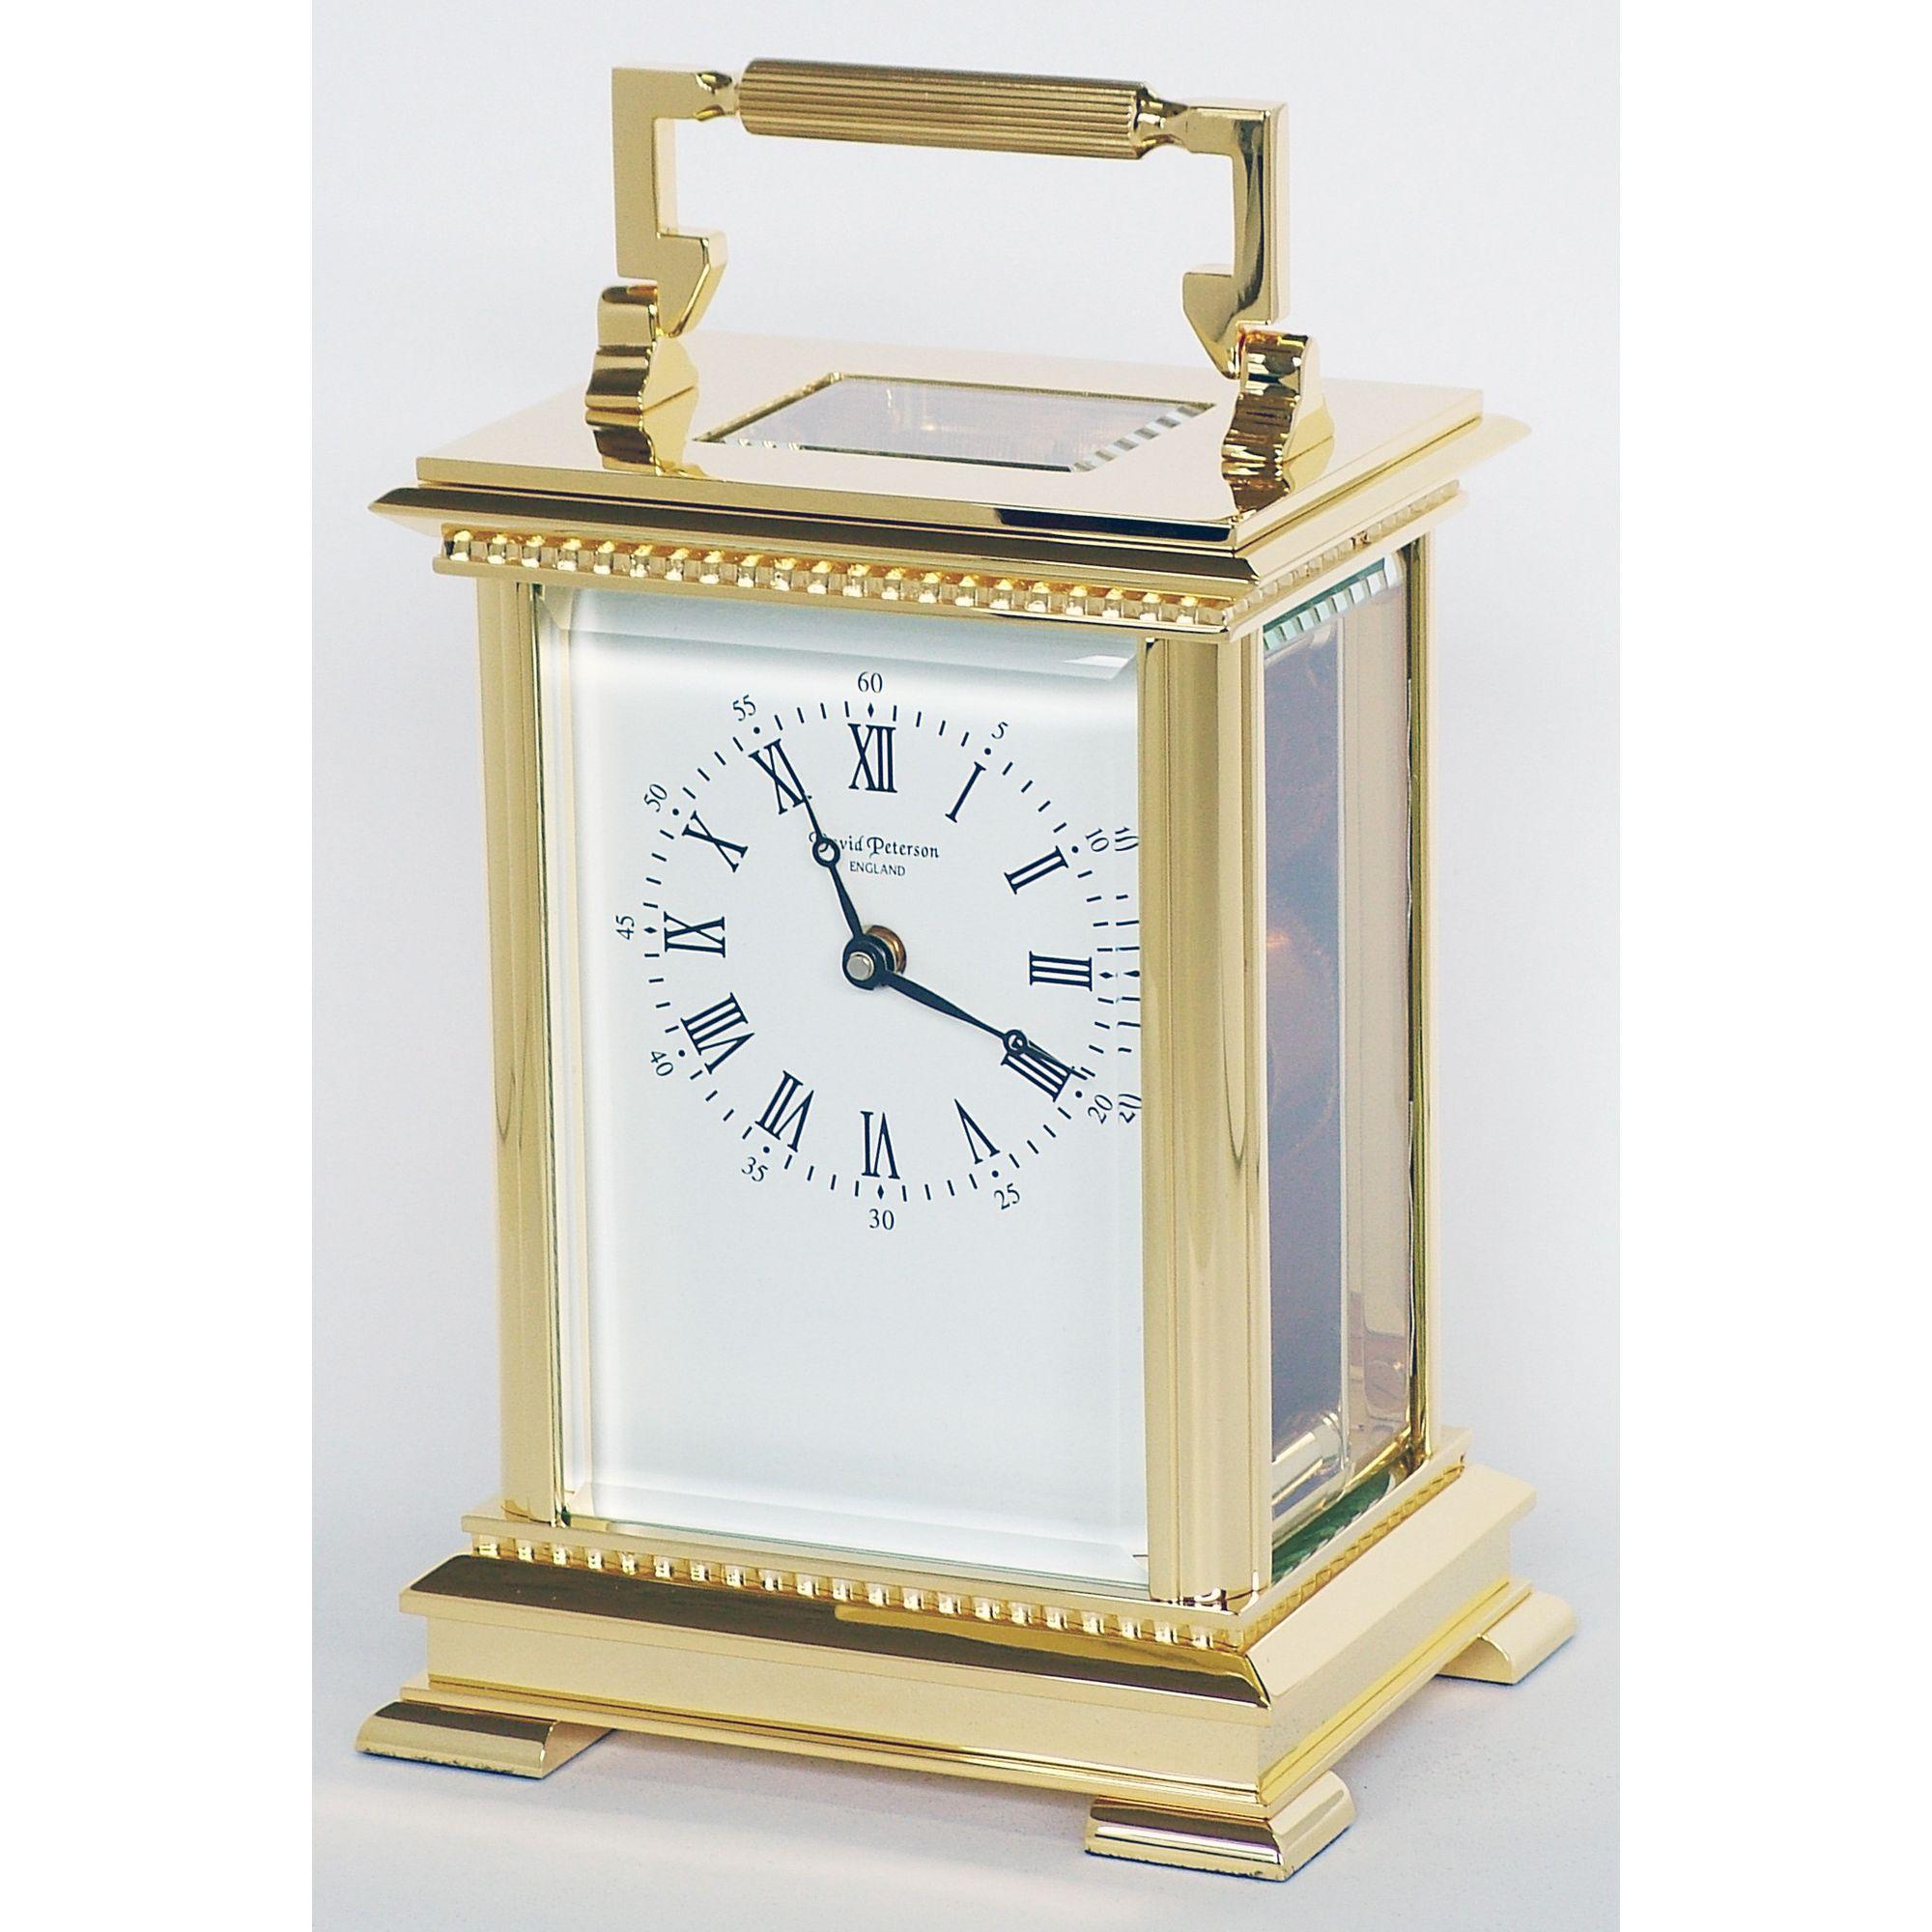 David Peterson Ltd 8 Day Grande Anglais Corinthian Carriage Clock at Tesco Direct